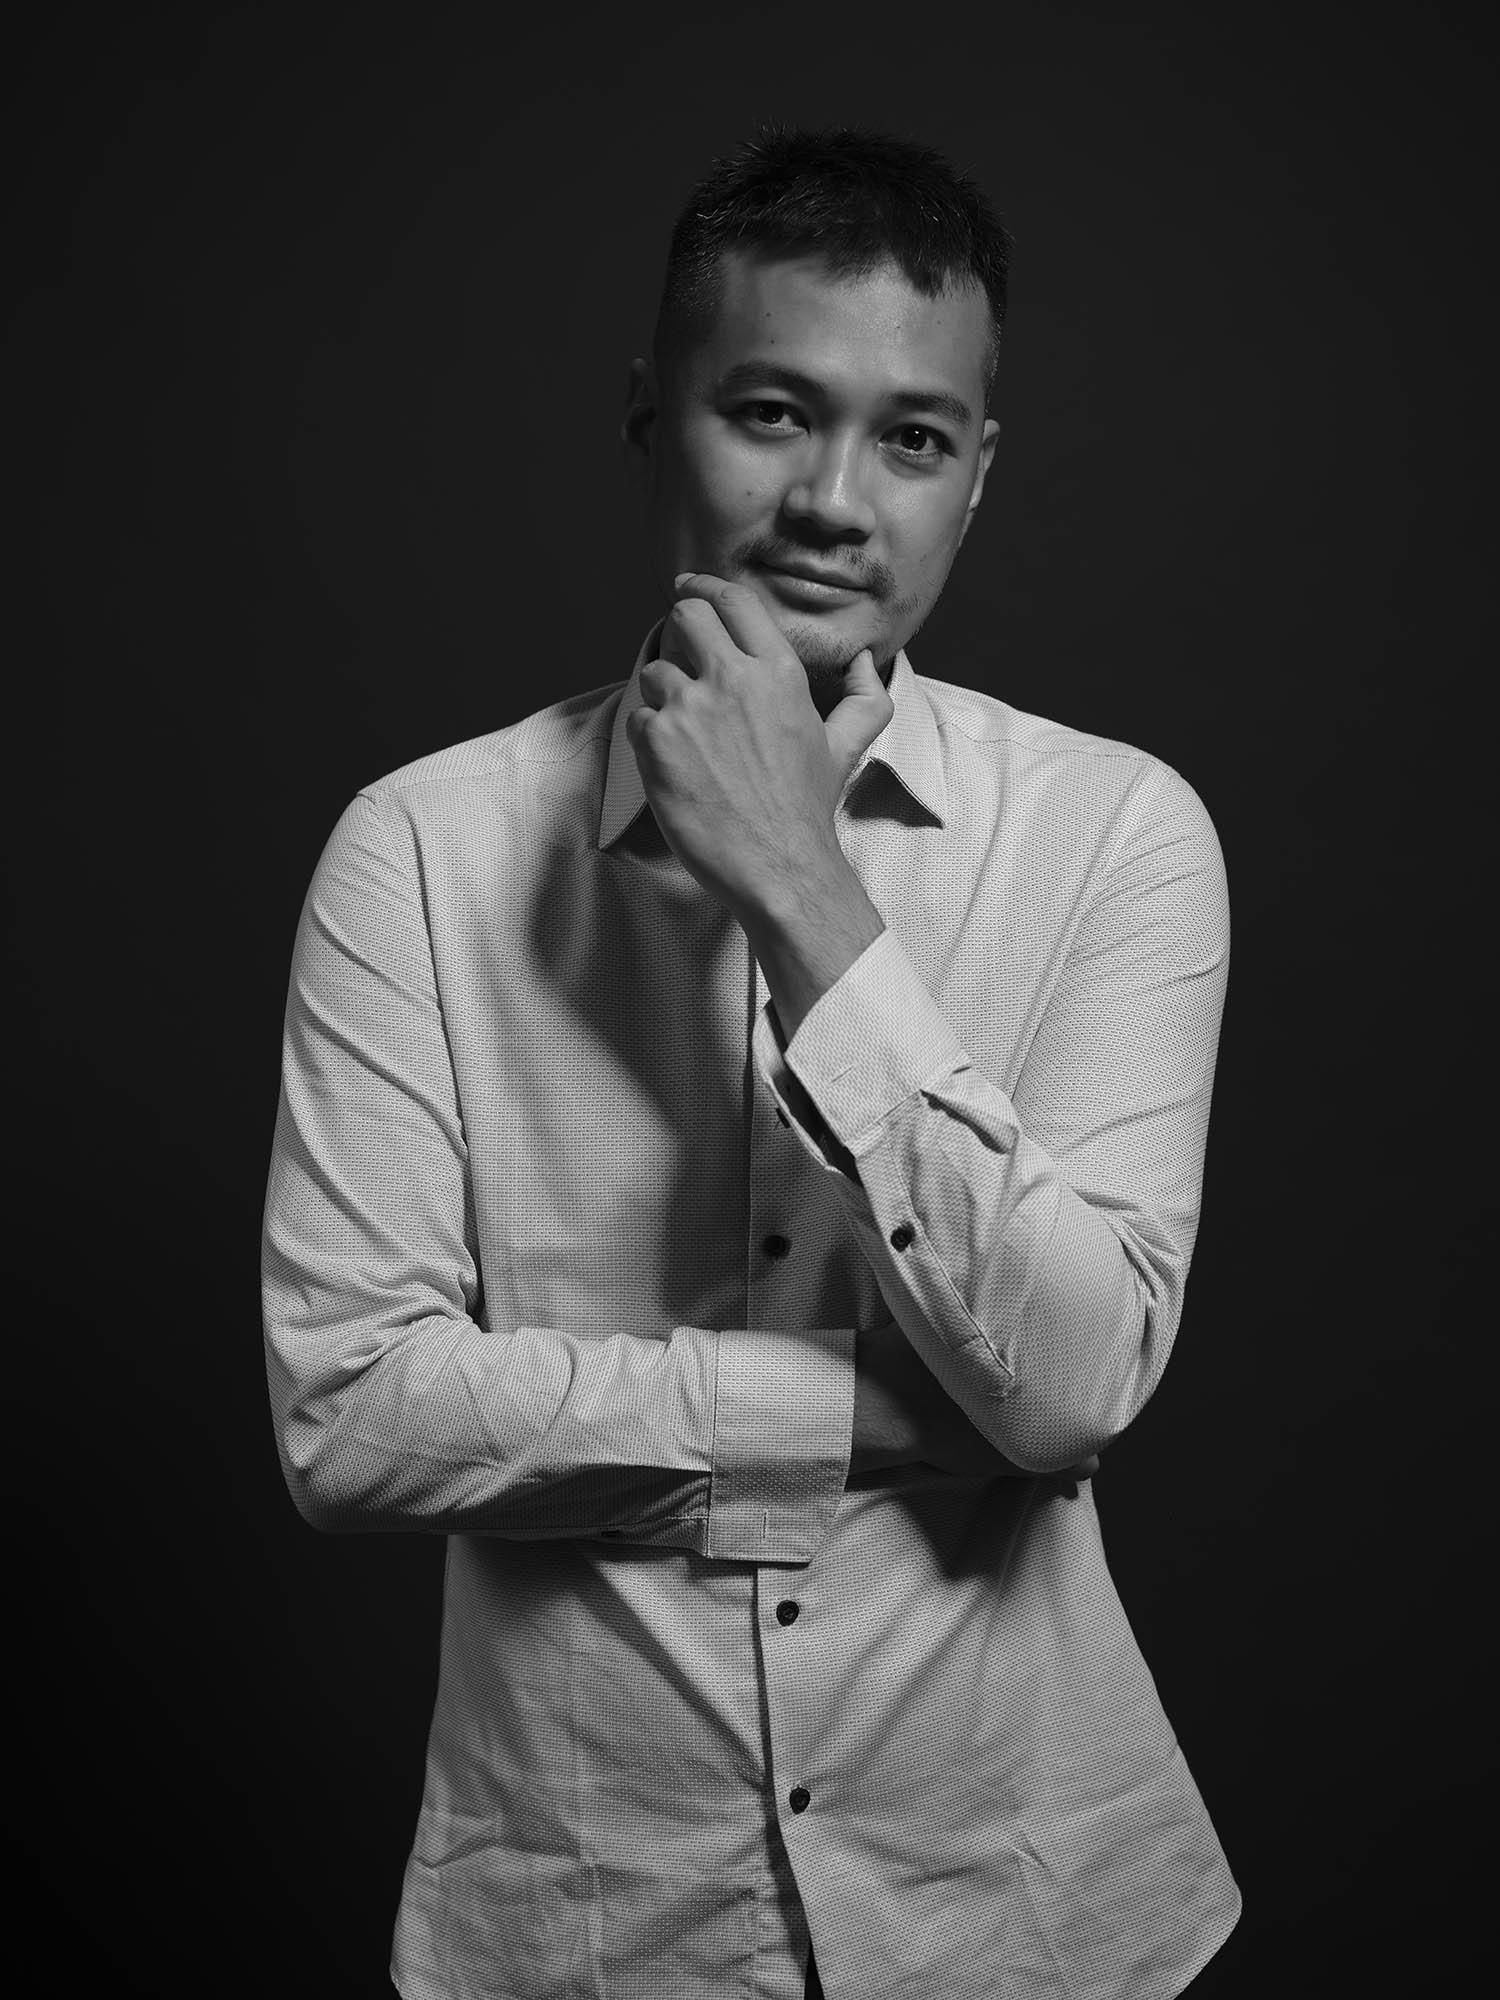 Ramboll Black and White Photography Portrait Photographer Singapore COCO Creative Studio 43